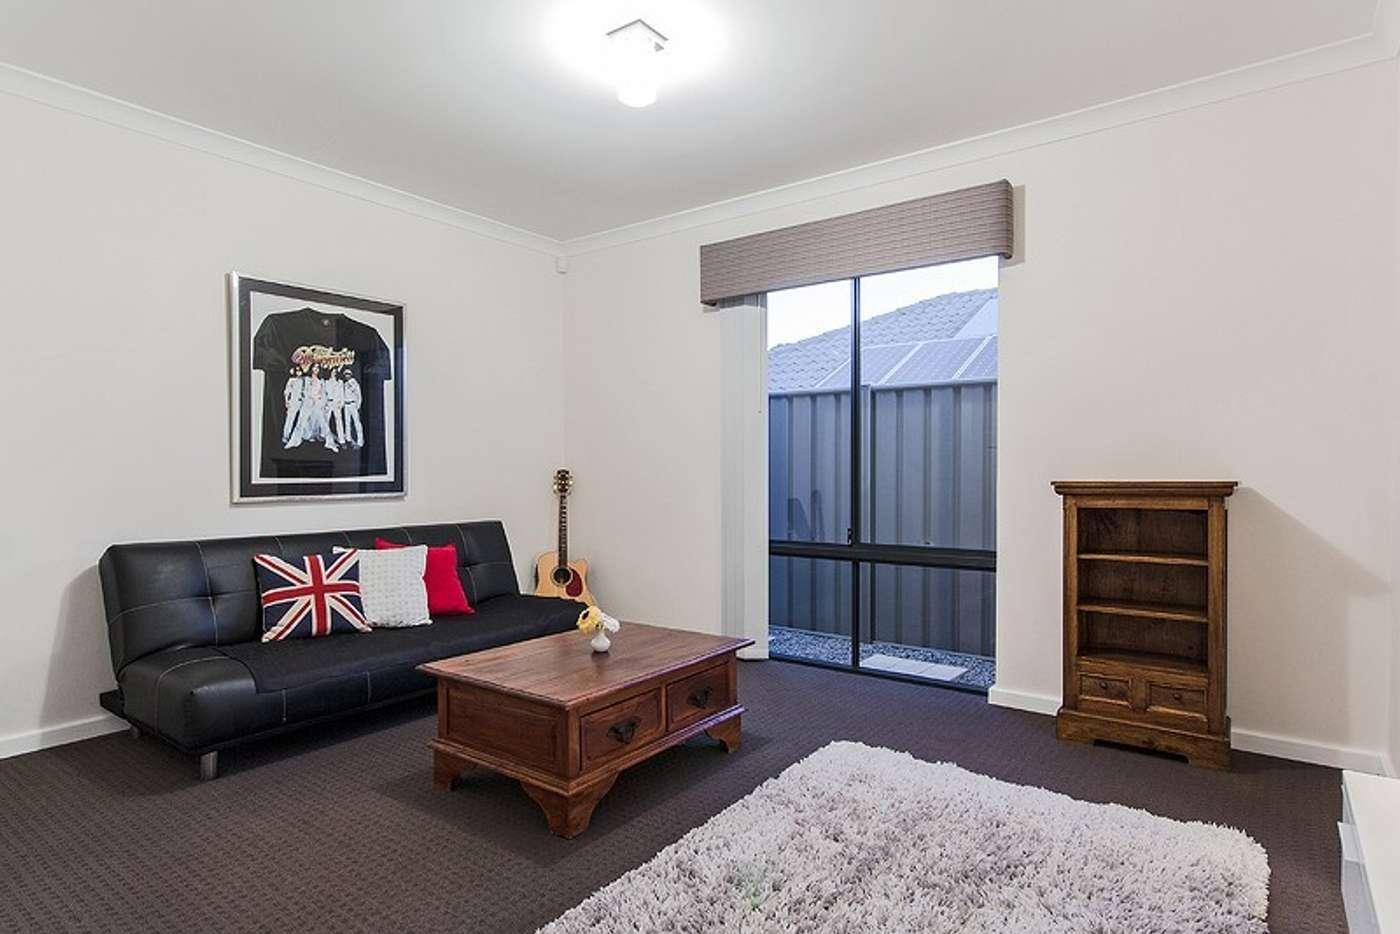 Seventh view of Homely house listing, 5 Maldon Link, Wellard WA 6170